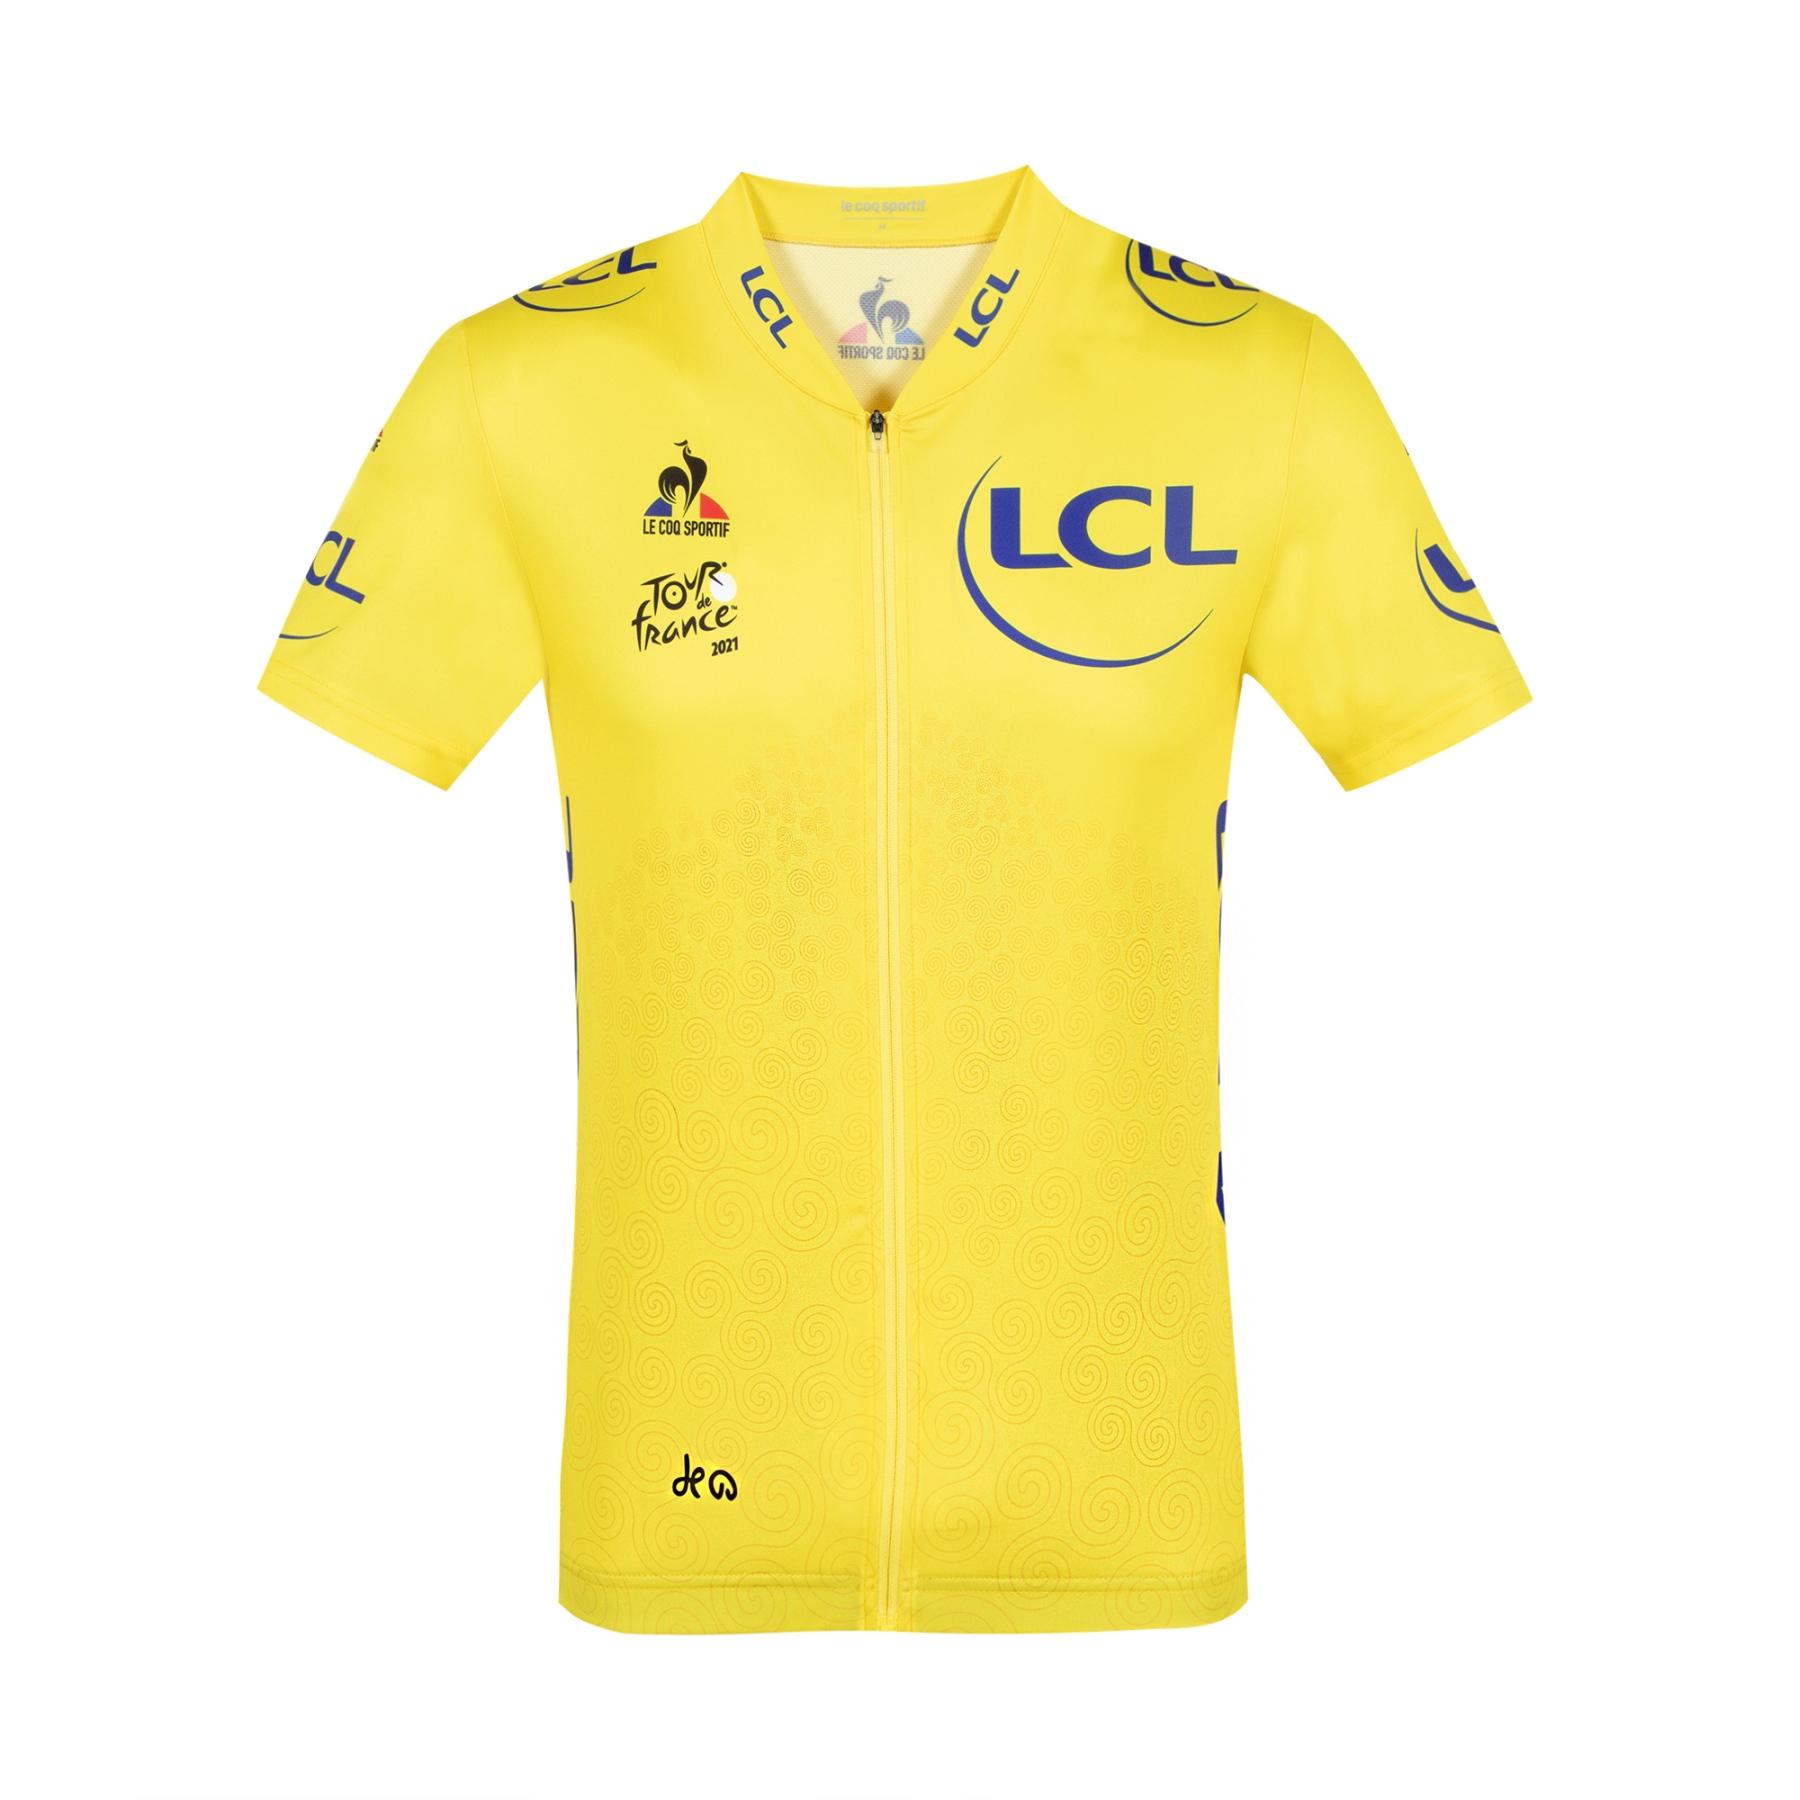 Le Coq Sportif Tour de France™ 2021 Collection Replica Kurzarm-Trikot - Gelb - Start